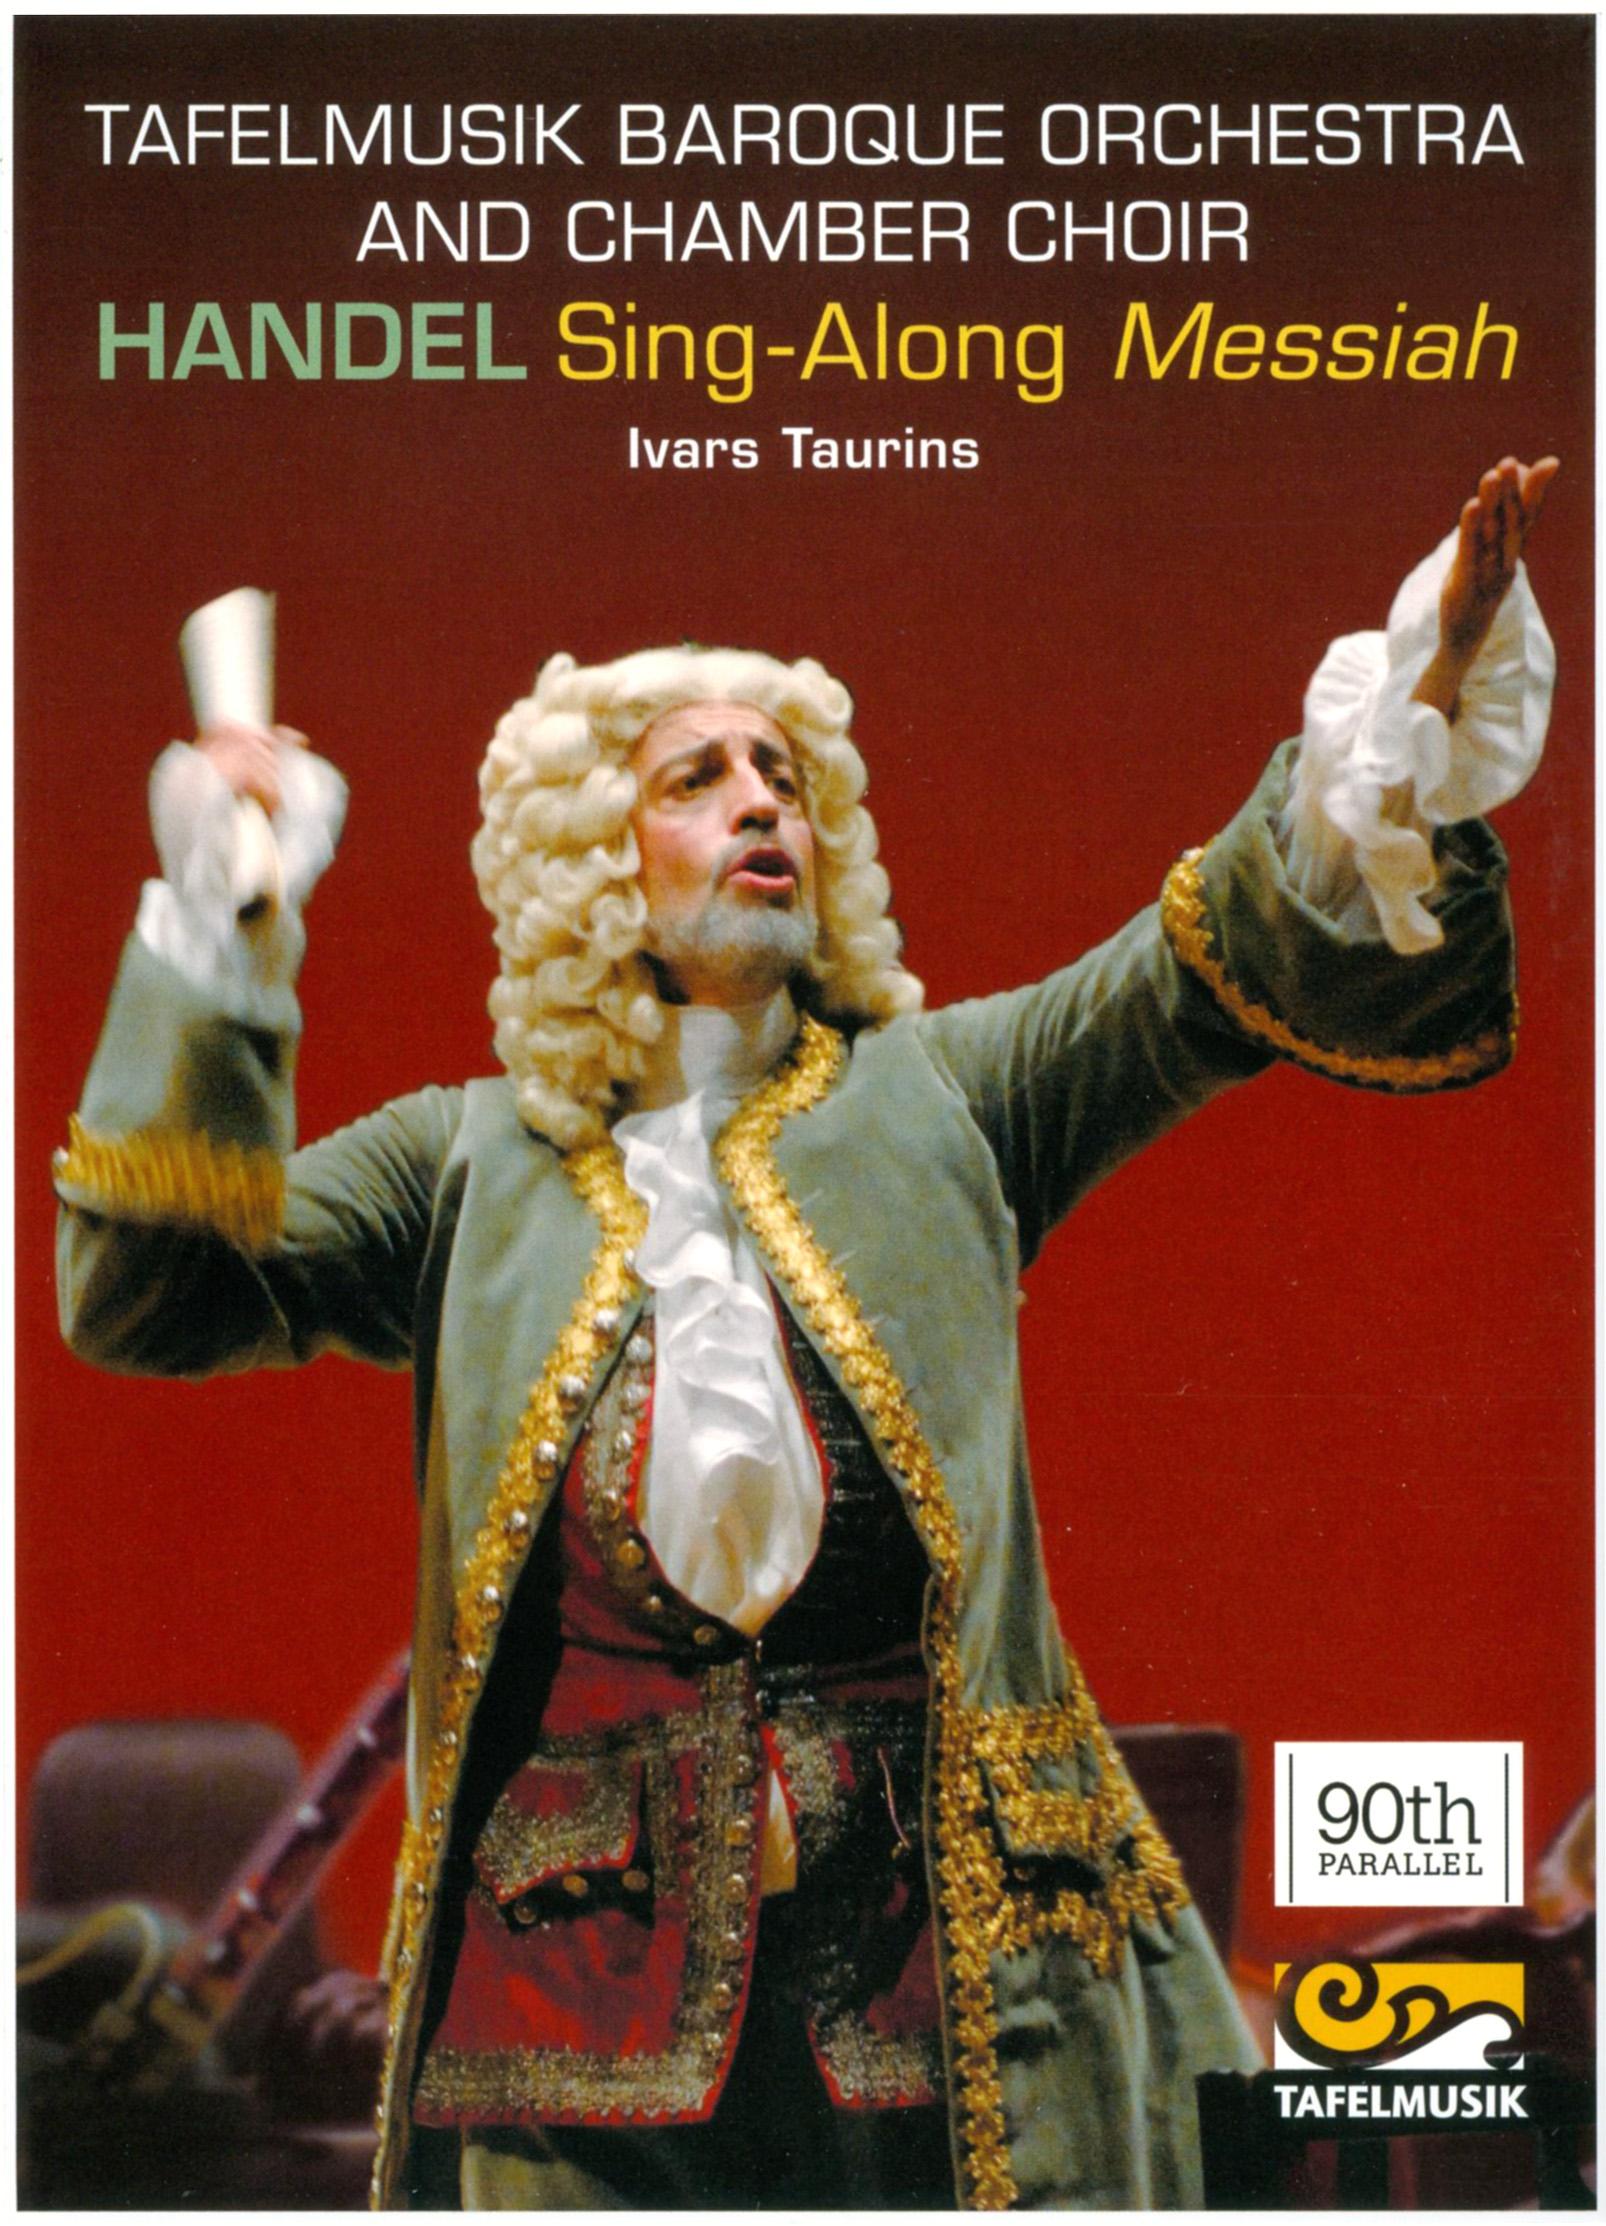 Tafelmusik Baroque Orchestra and Chamber Choir: Handel - Sing-Along Messiah